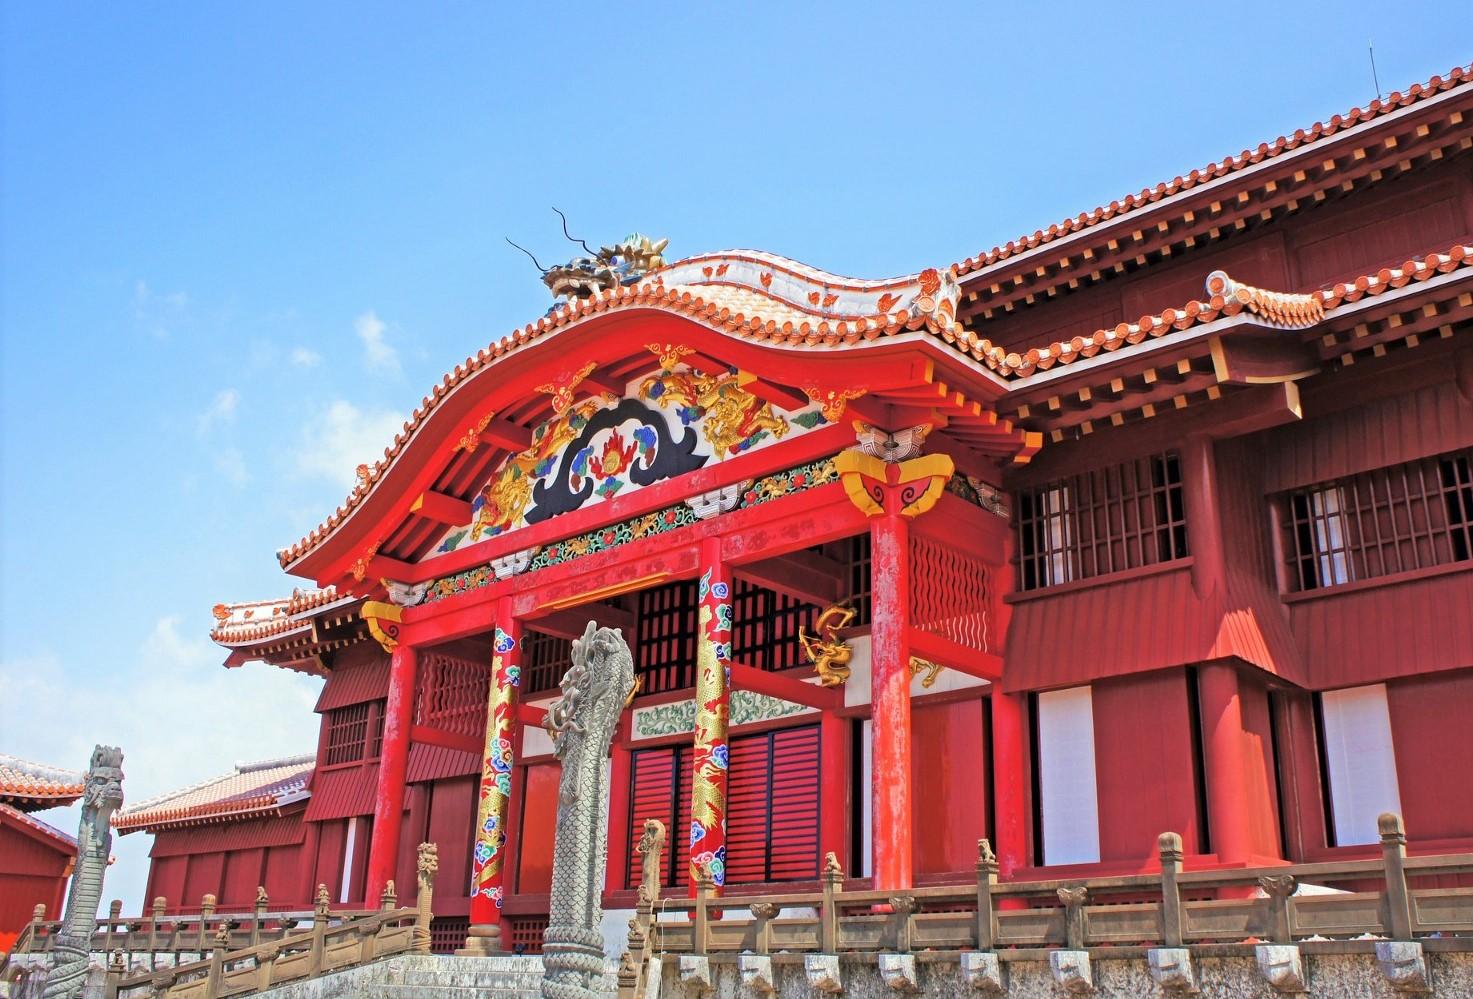 The UNESCO World Heritage Site, Shuri Castle in Okinawa